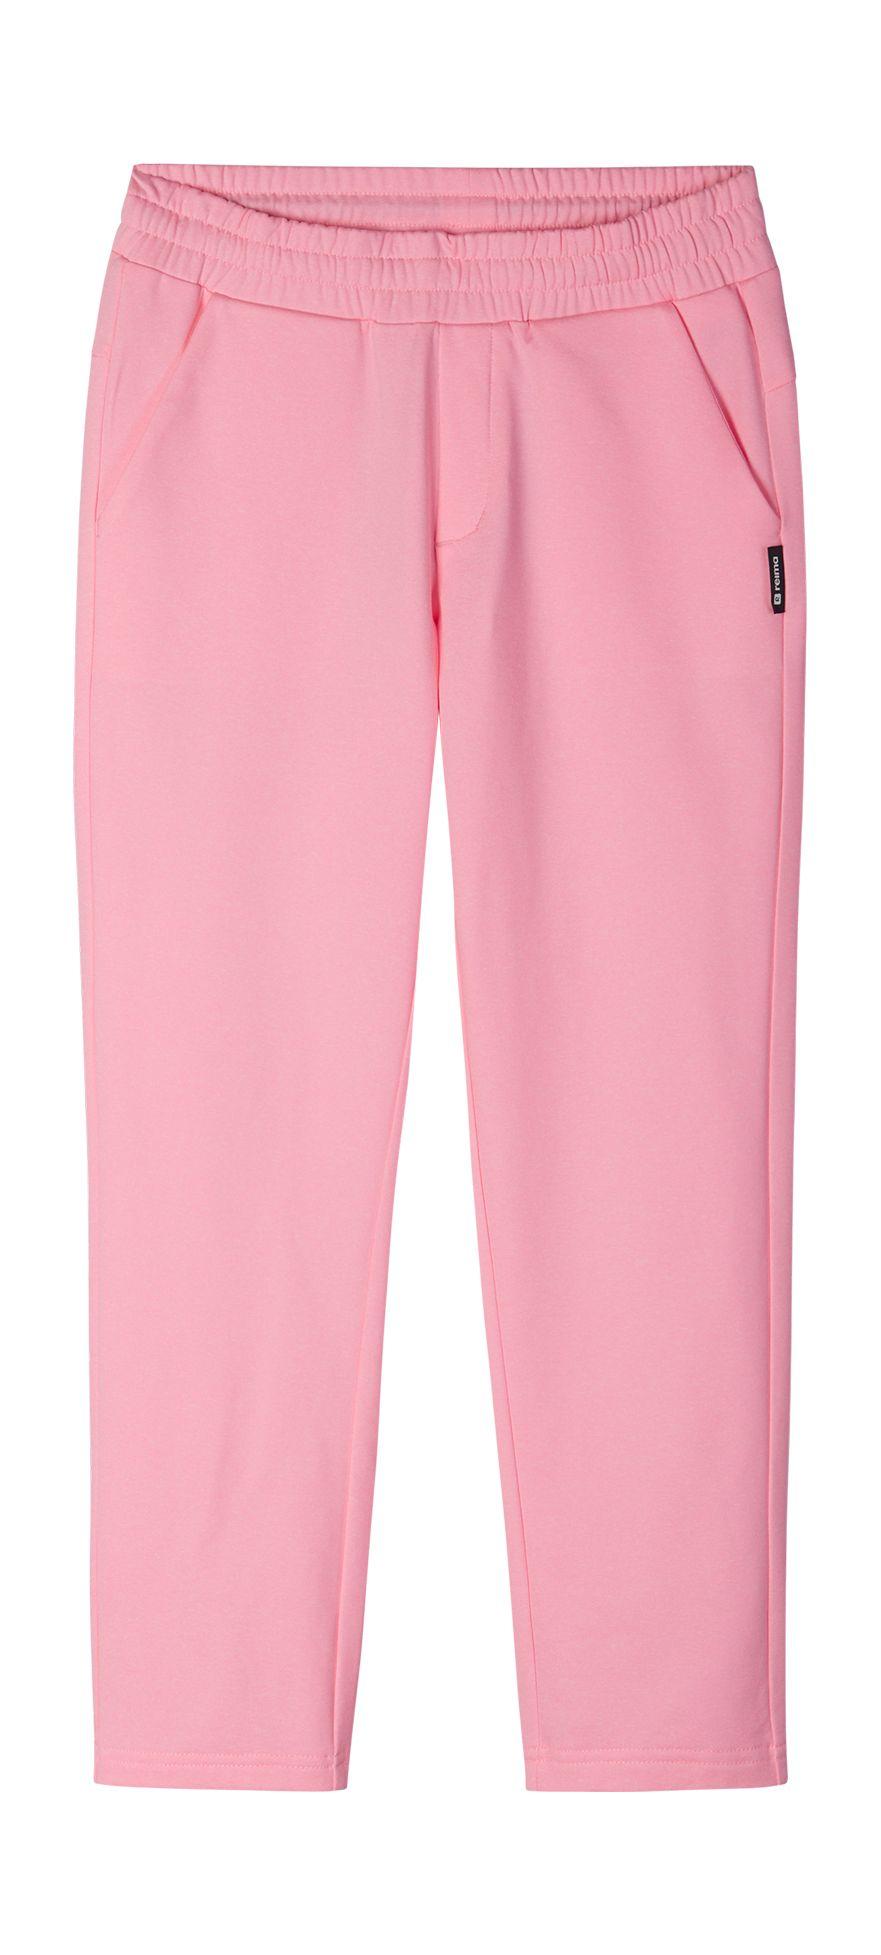 REIMA Tuumi Neon Pink 146